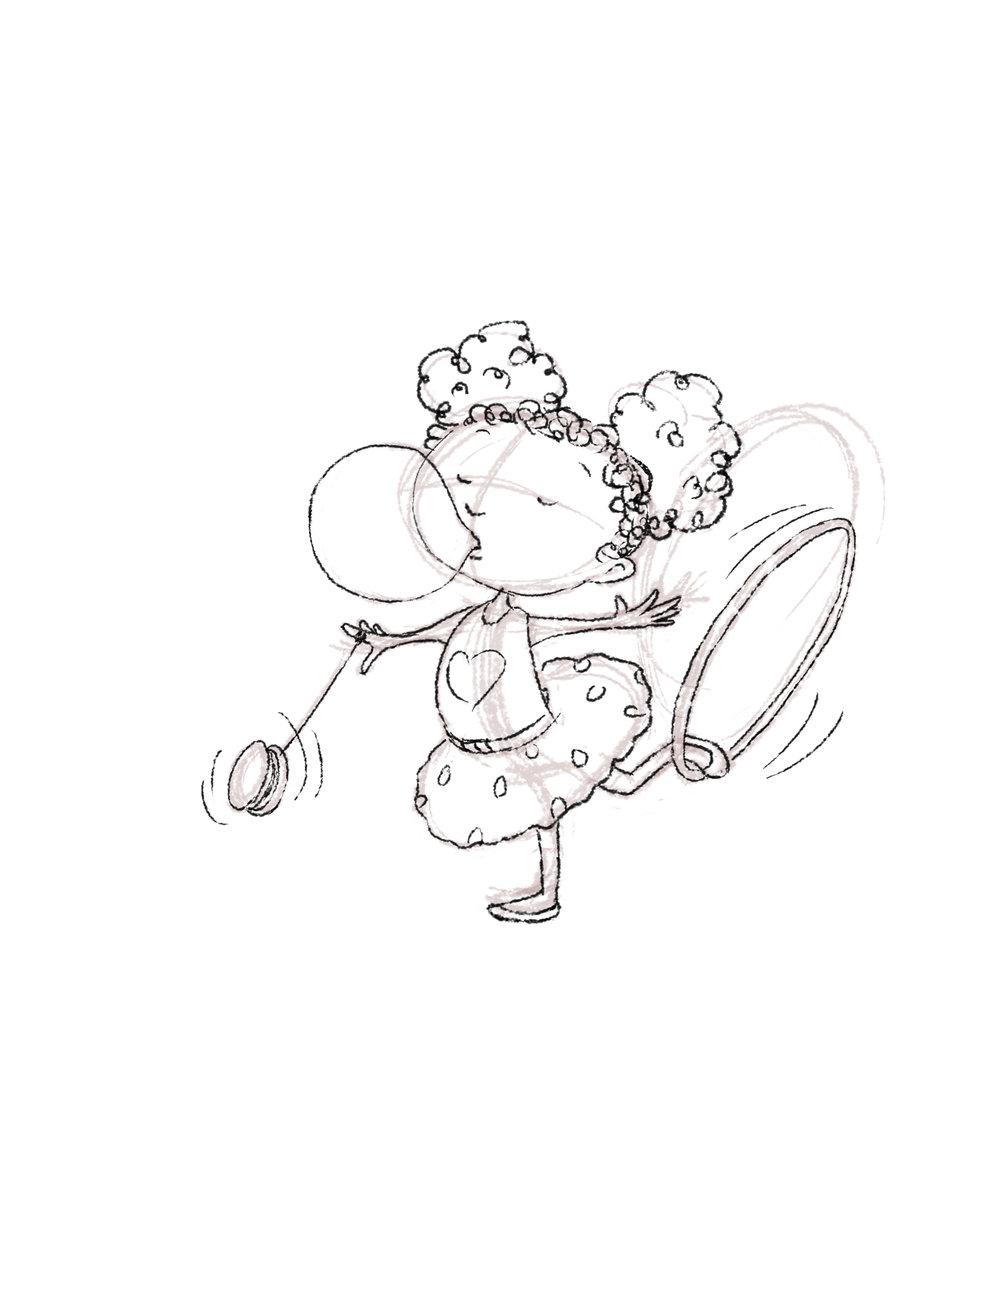 hula girl.jpg